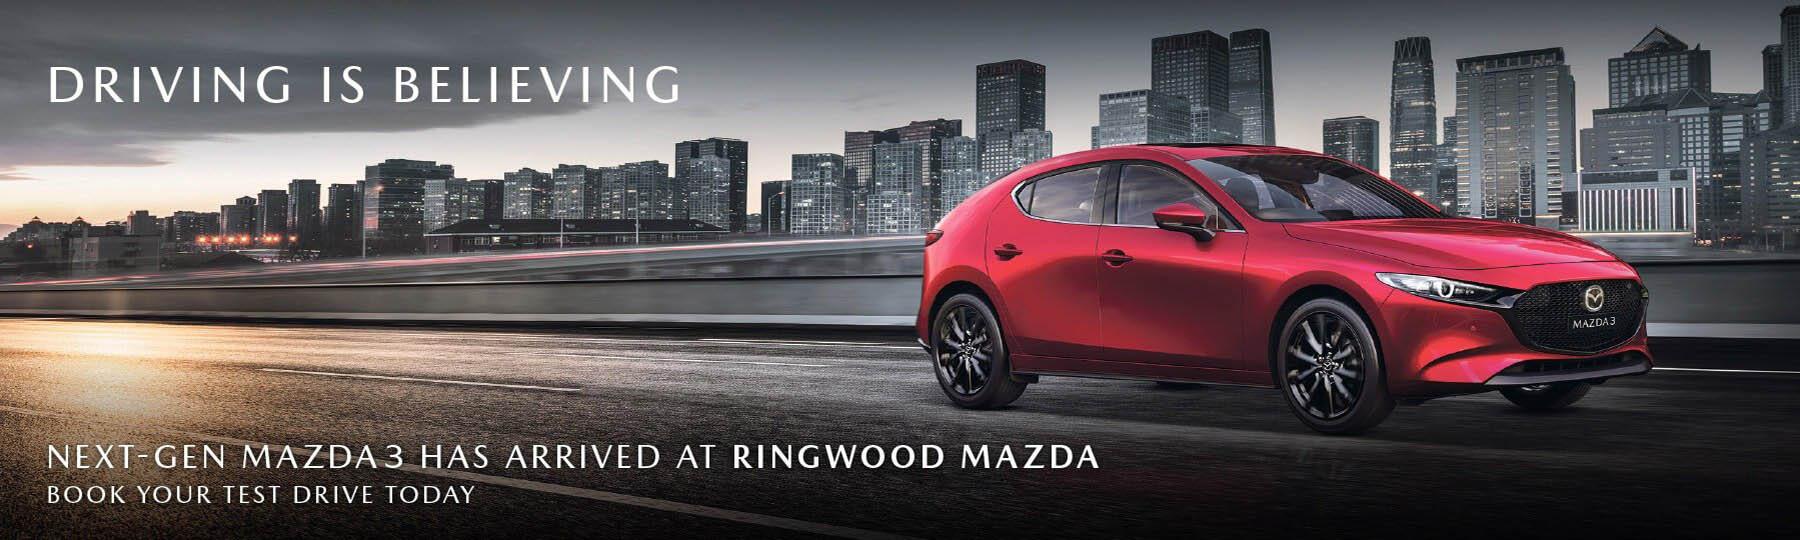 Ringwood Mazda Next-Gen Mazda3